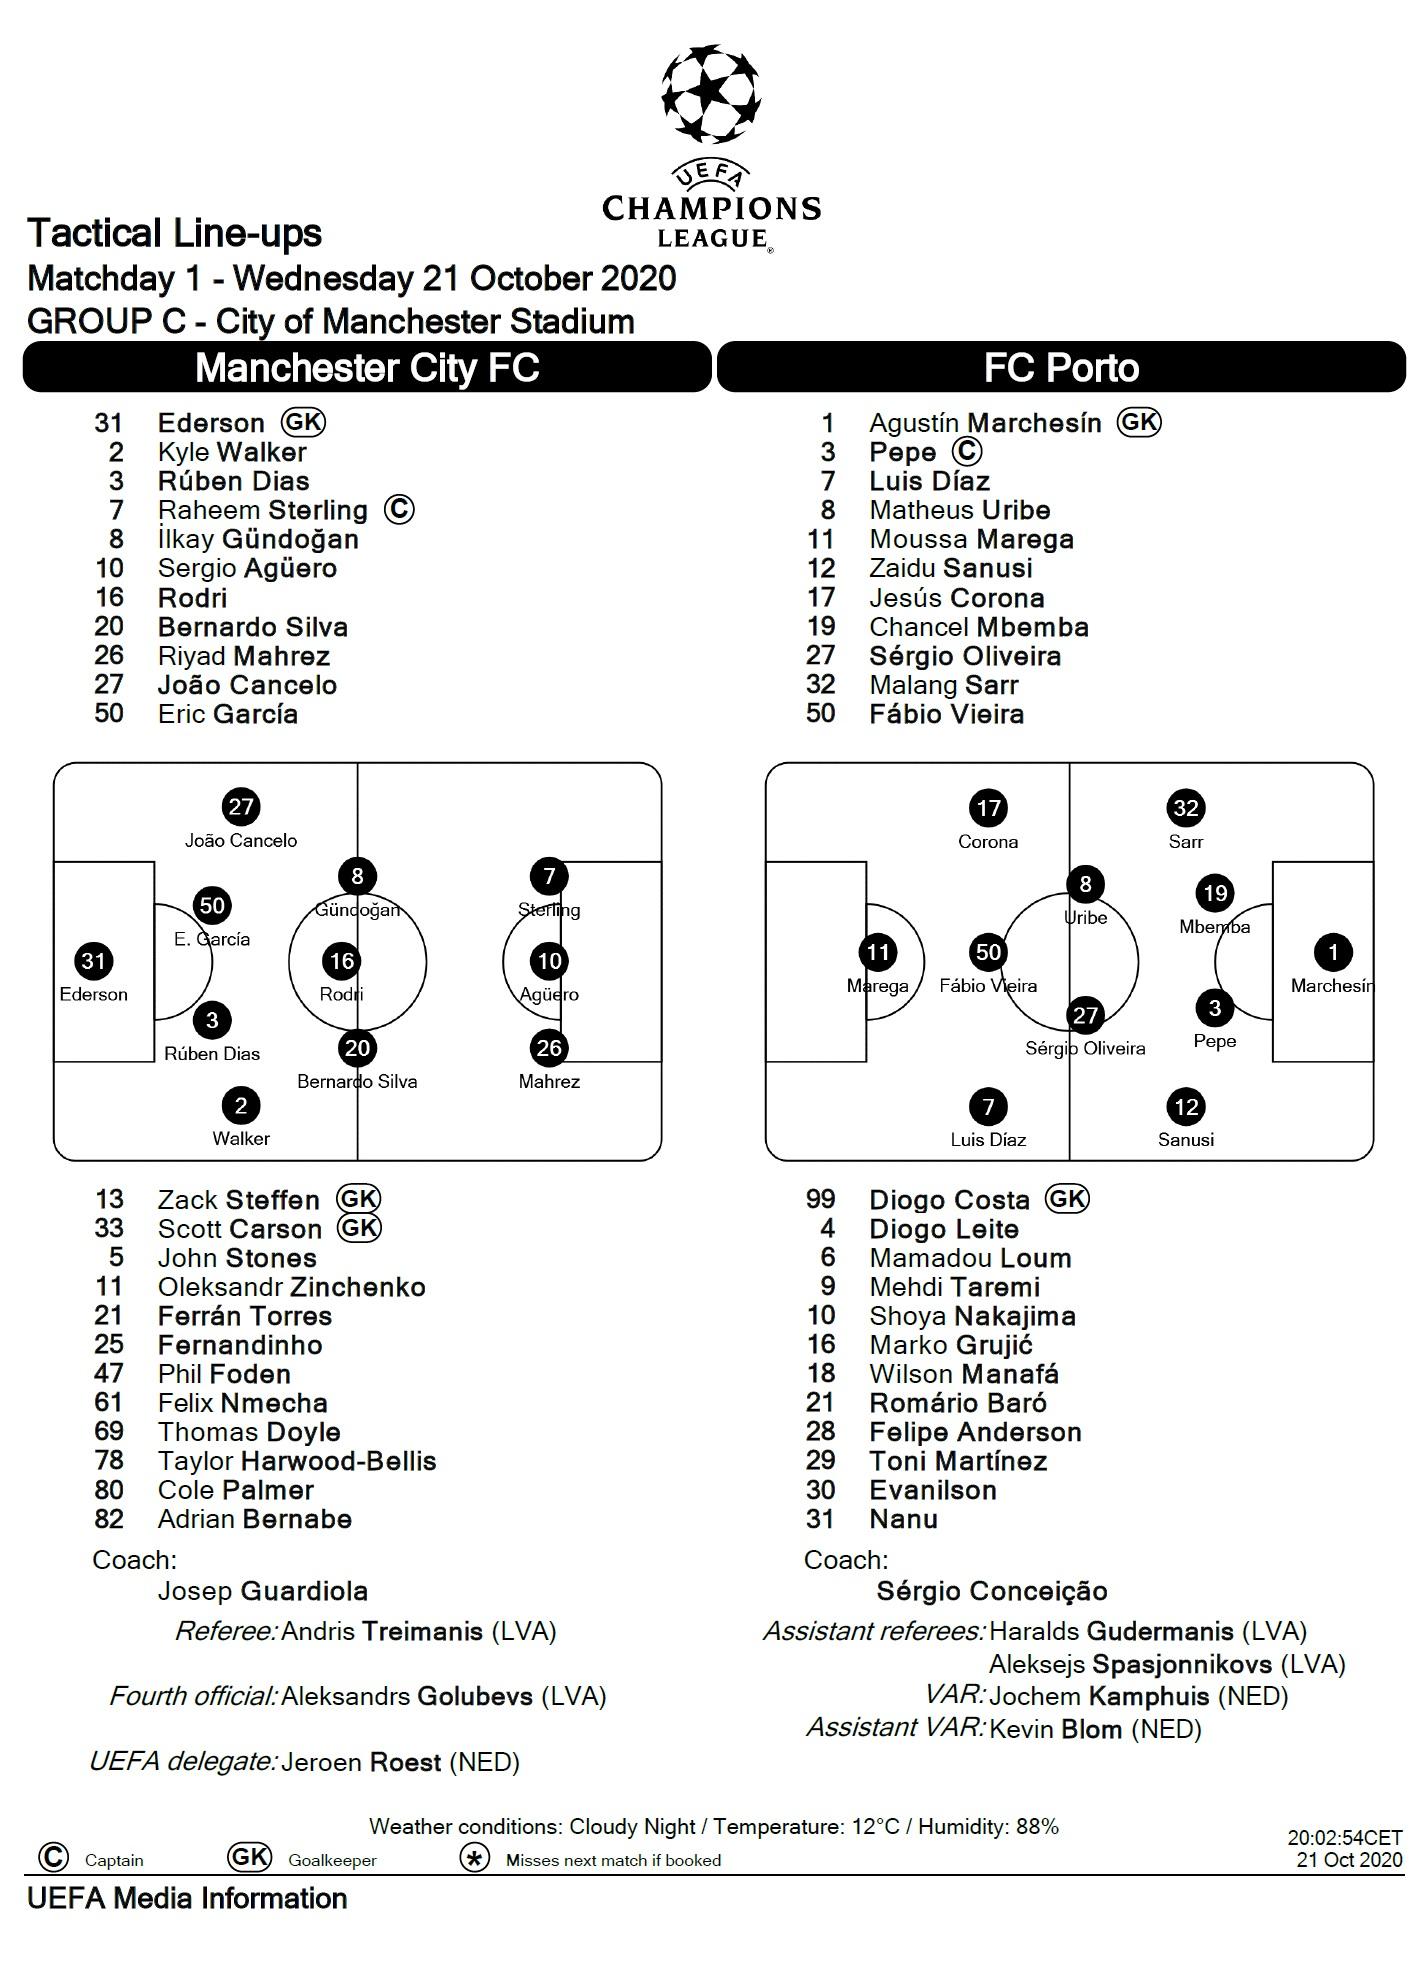 Манчестер Сити (Англия) - Порту (Португалия) 3:1